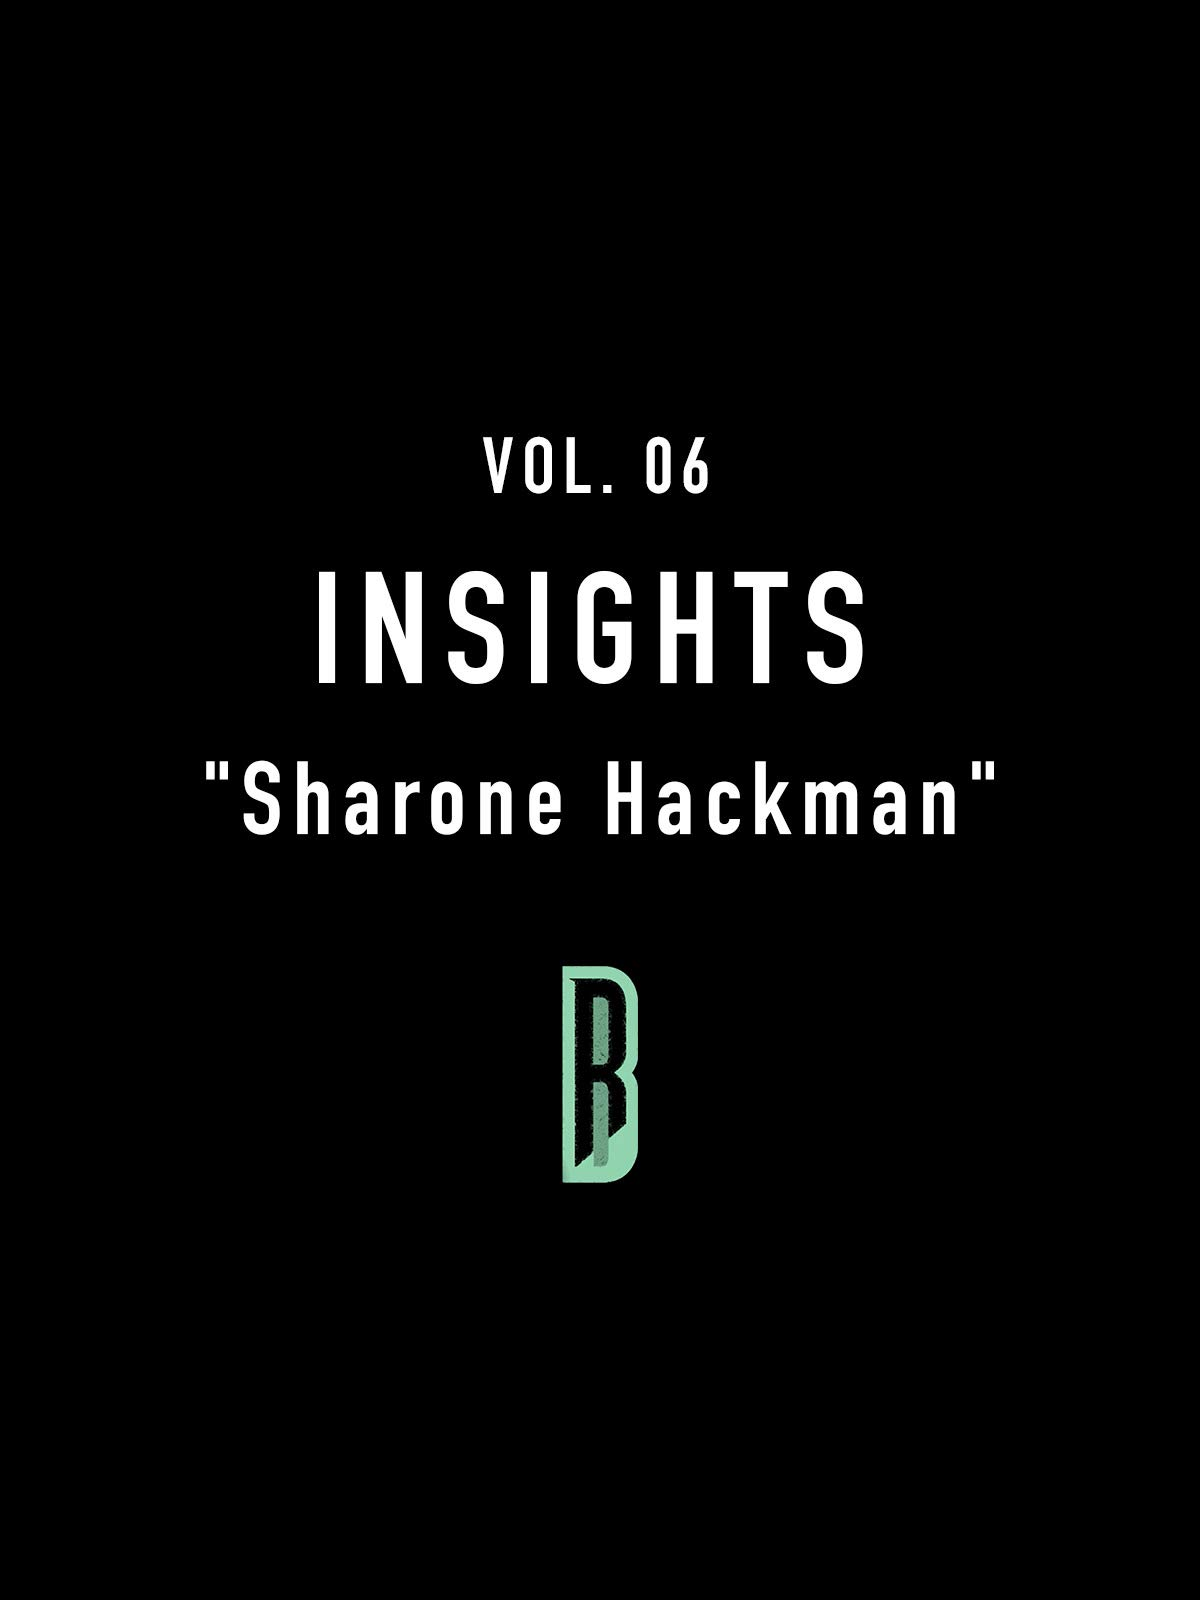 Insights Vol. 06